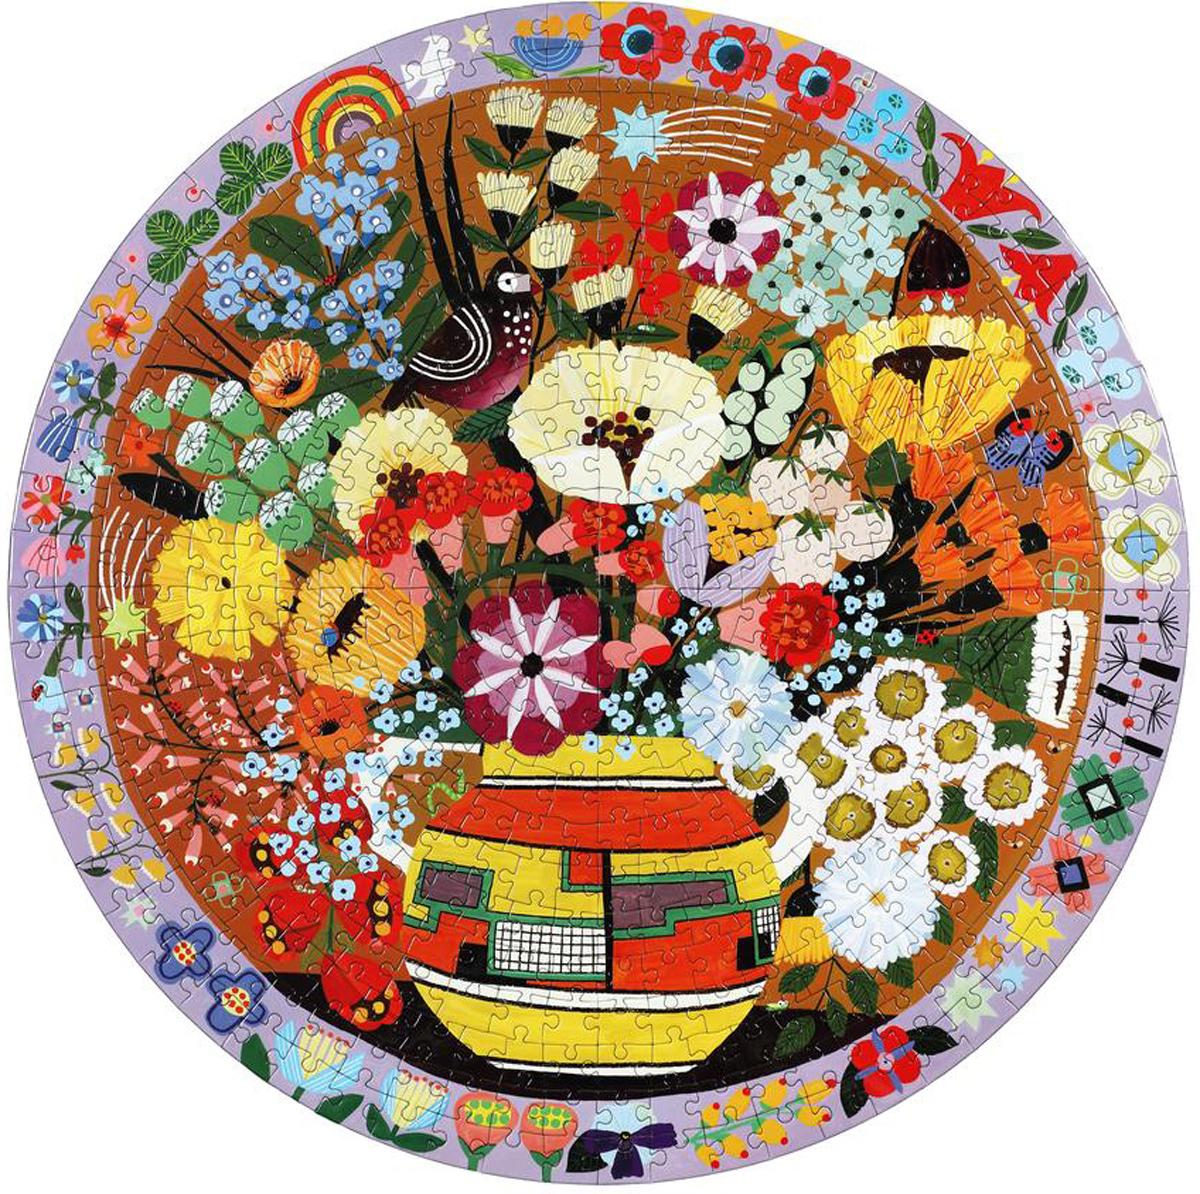 Purple Bird and Flowers Flowers Jigsaw Puzzle